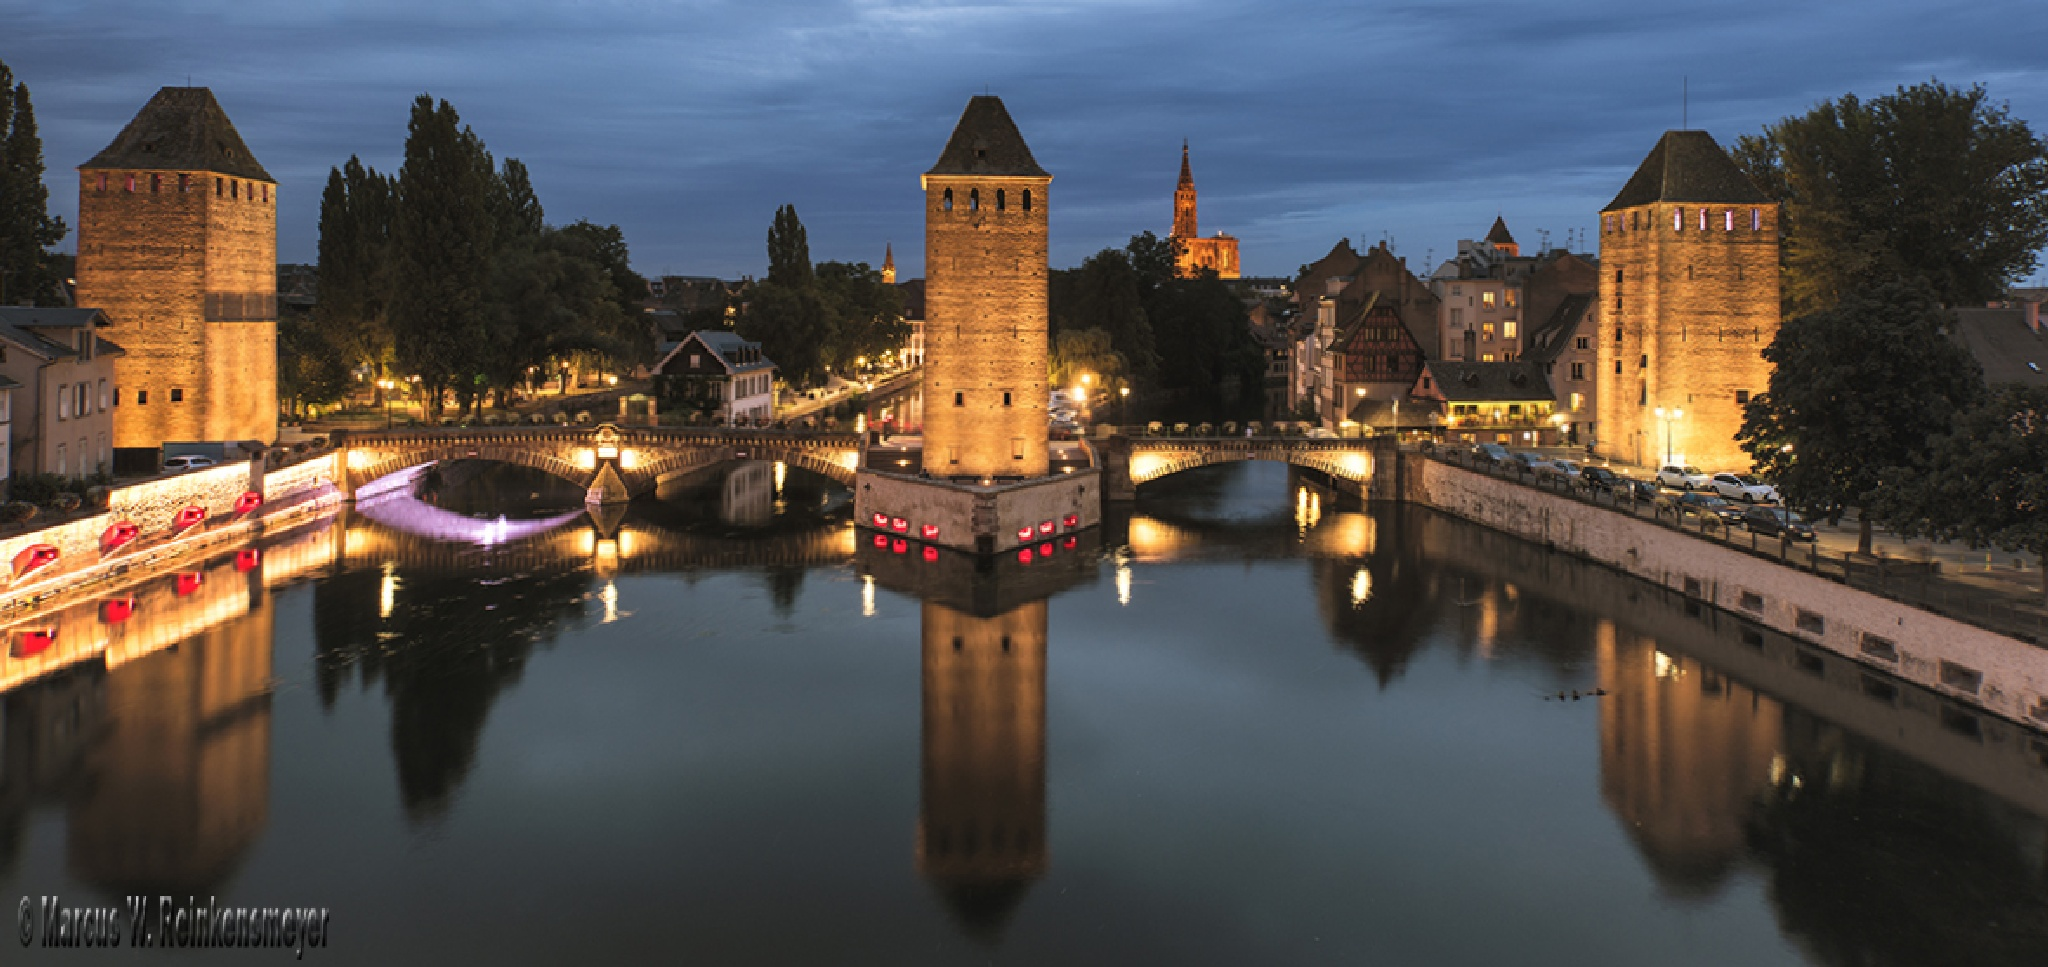 Night Falls on Strasbourg, France  by reinkensmeyer